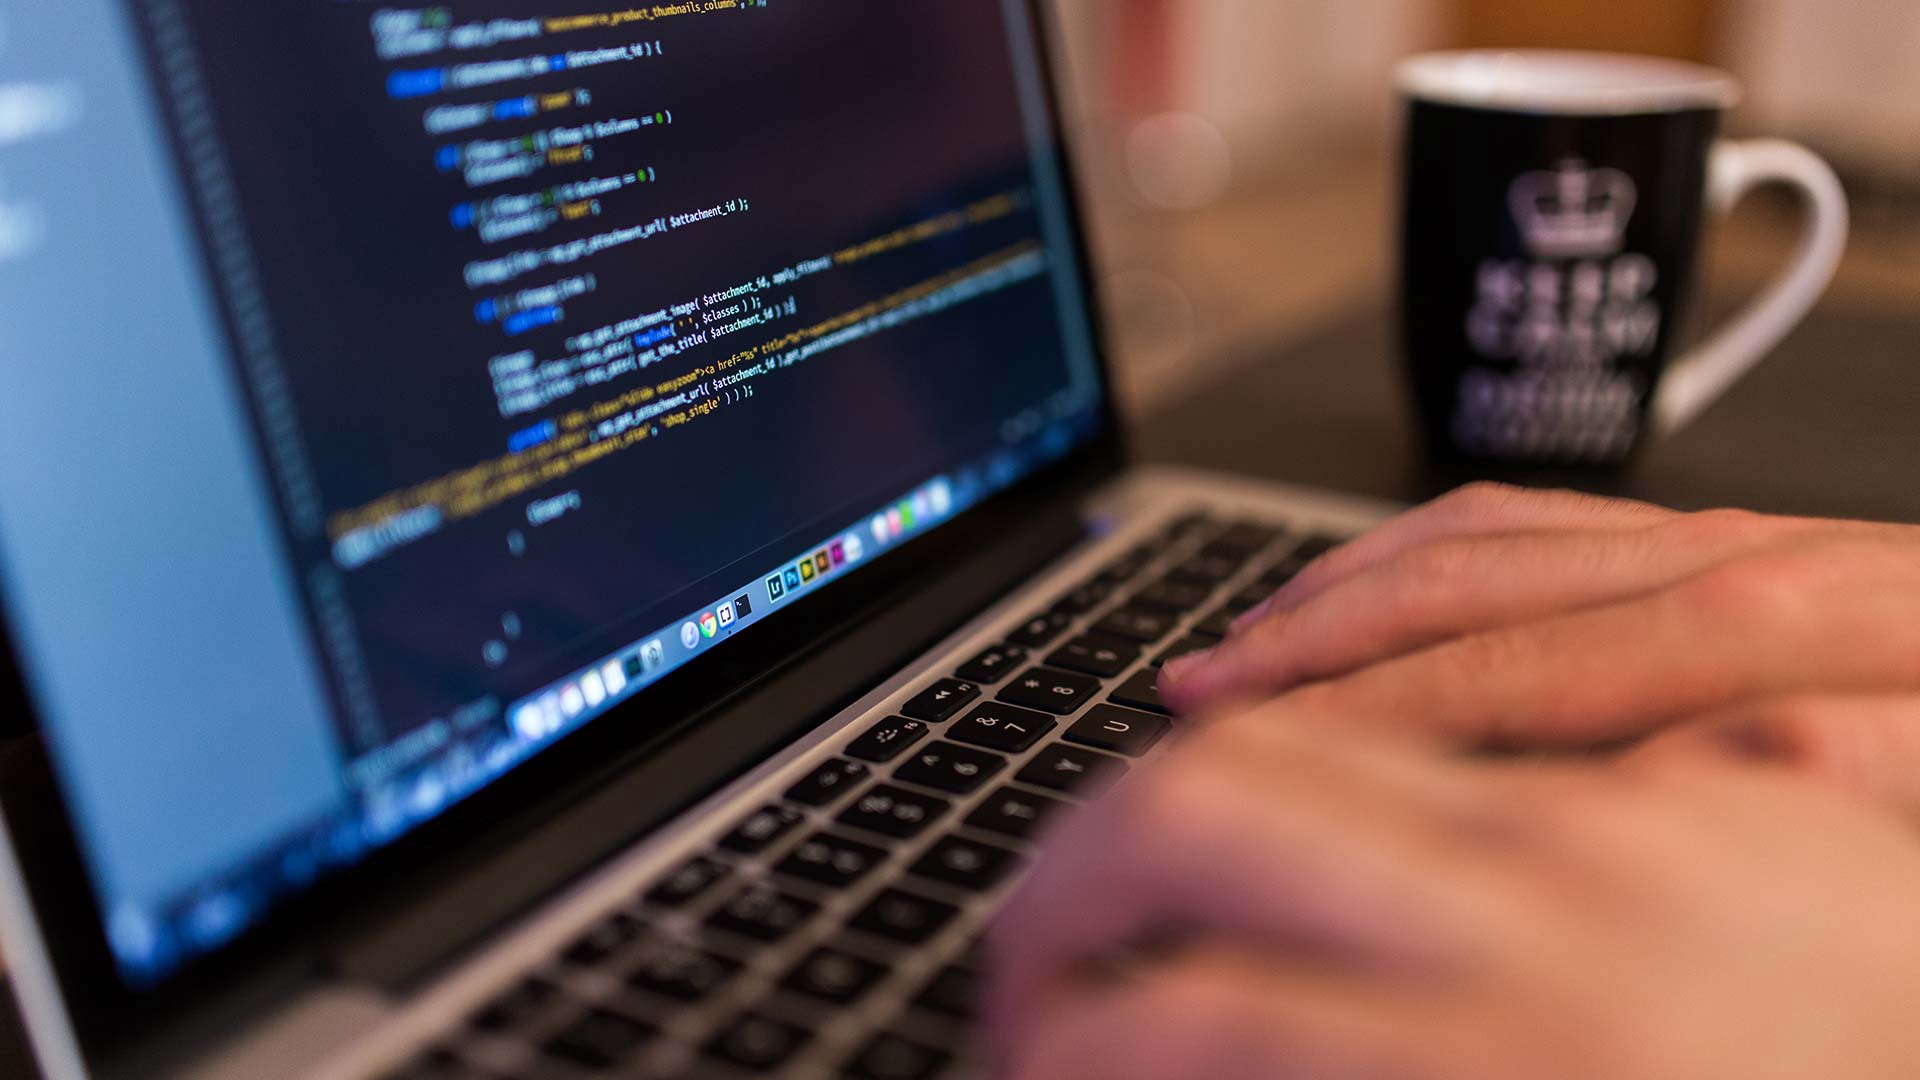 diseño-y-programacion-web-wordpress-aranjuez